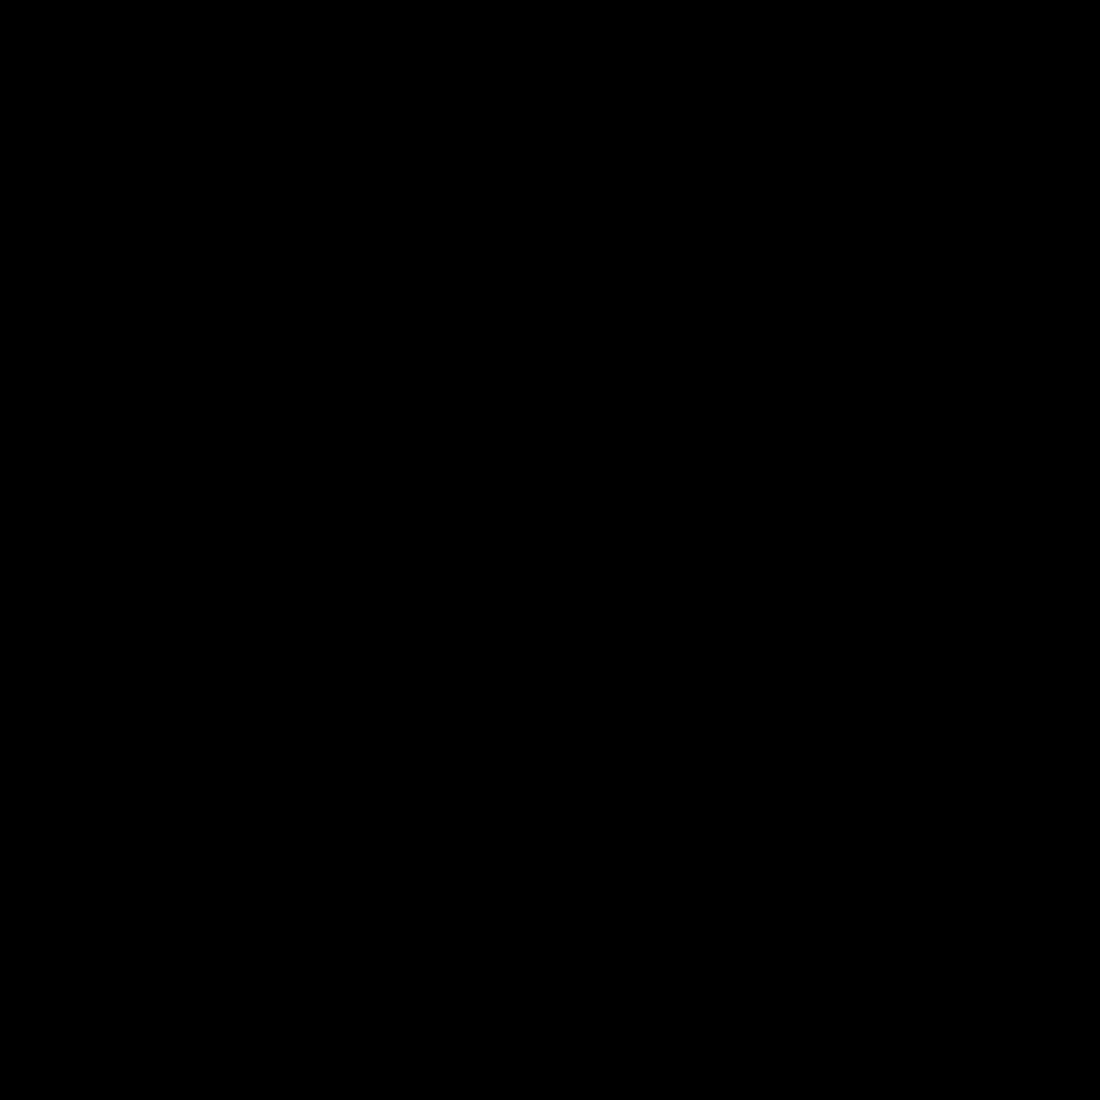 Plegium Smart Pepper Spray - Self Defense Pepper Spray For Women, The First Pepper Spray For Personal Defense With Emergency Location Text Messages, Phone Calls, Built-in Siren & Strobe Lights (Black) by Plegium (Image #2)